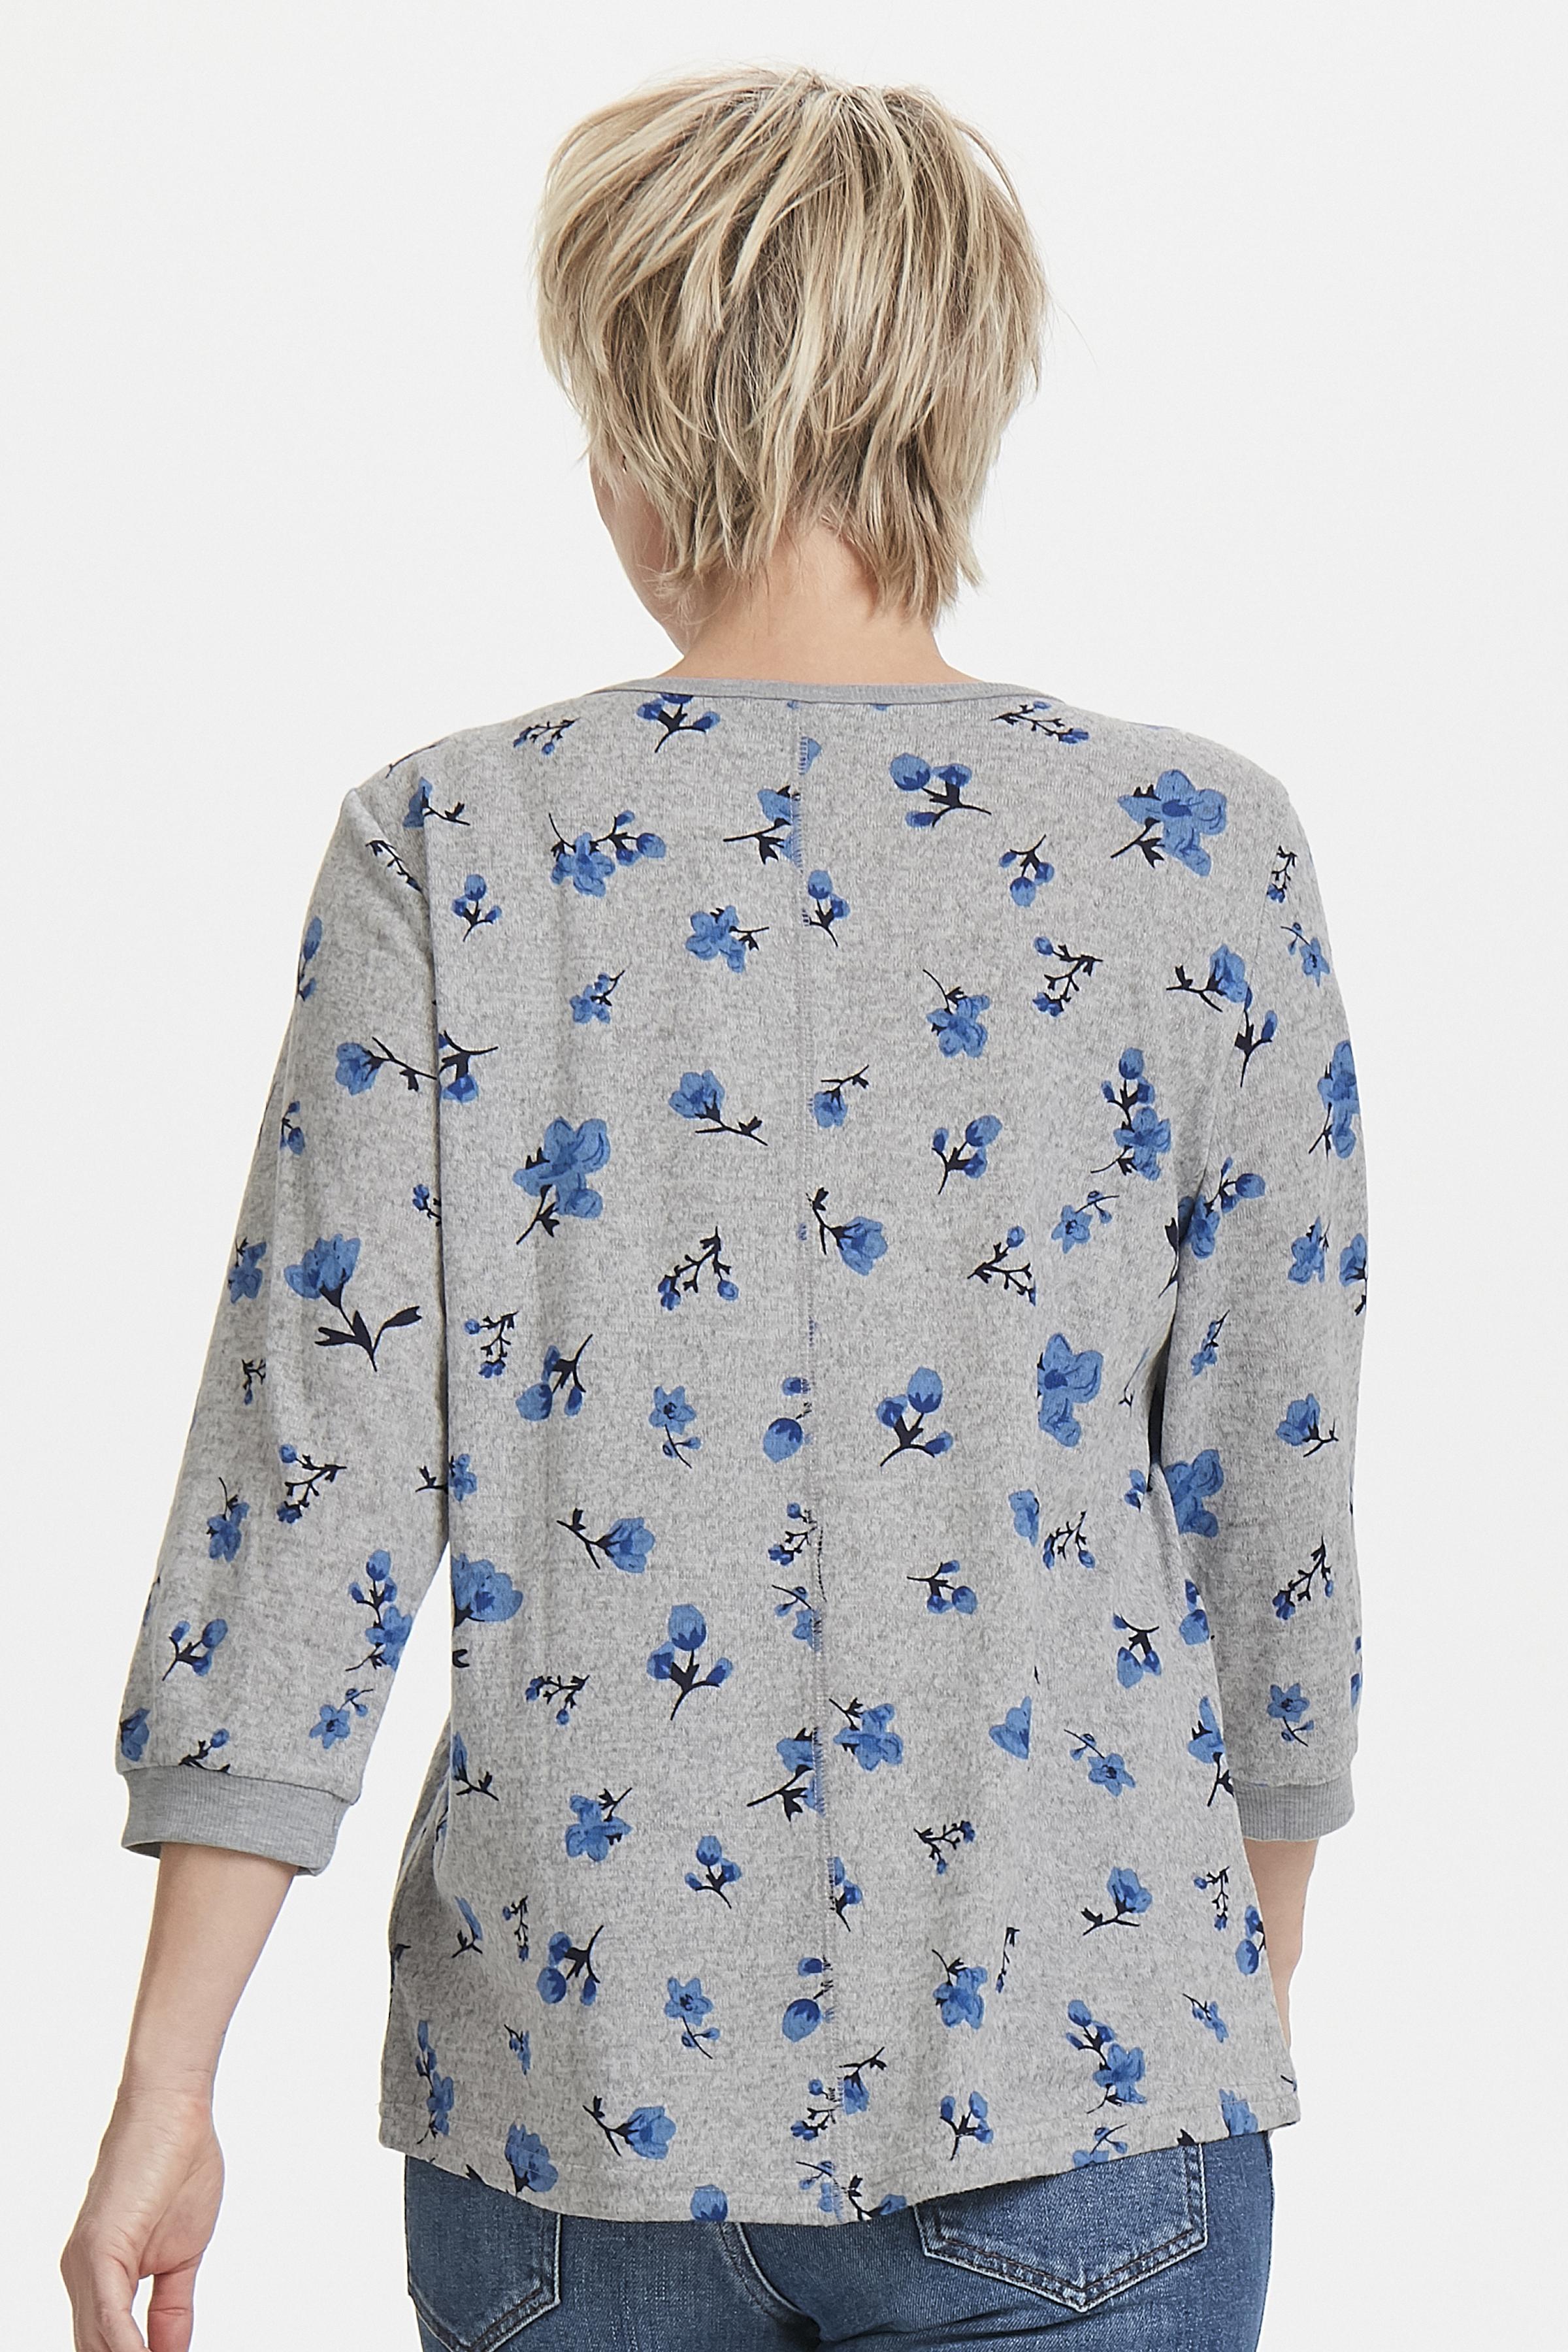 Hellgrau meliert/blau Bluse von Fransa – Shoppen SieHellgrau meliert/blau Bluse ab Gr. XS-XXL hier